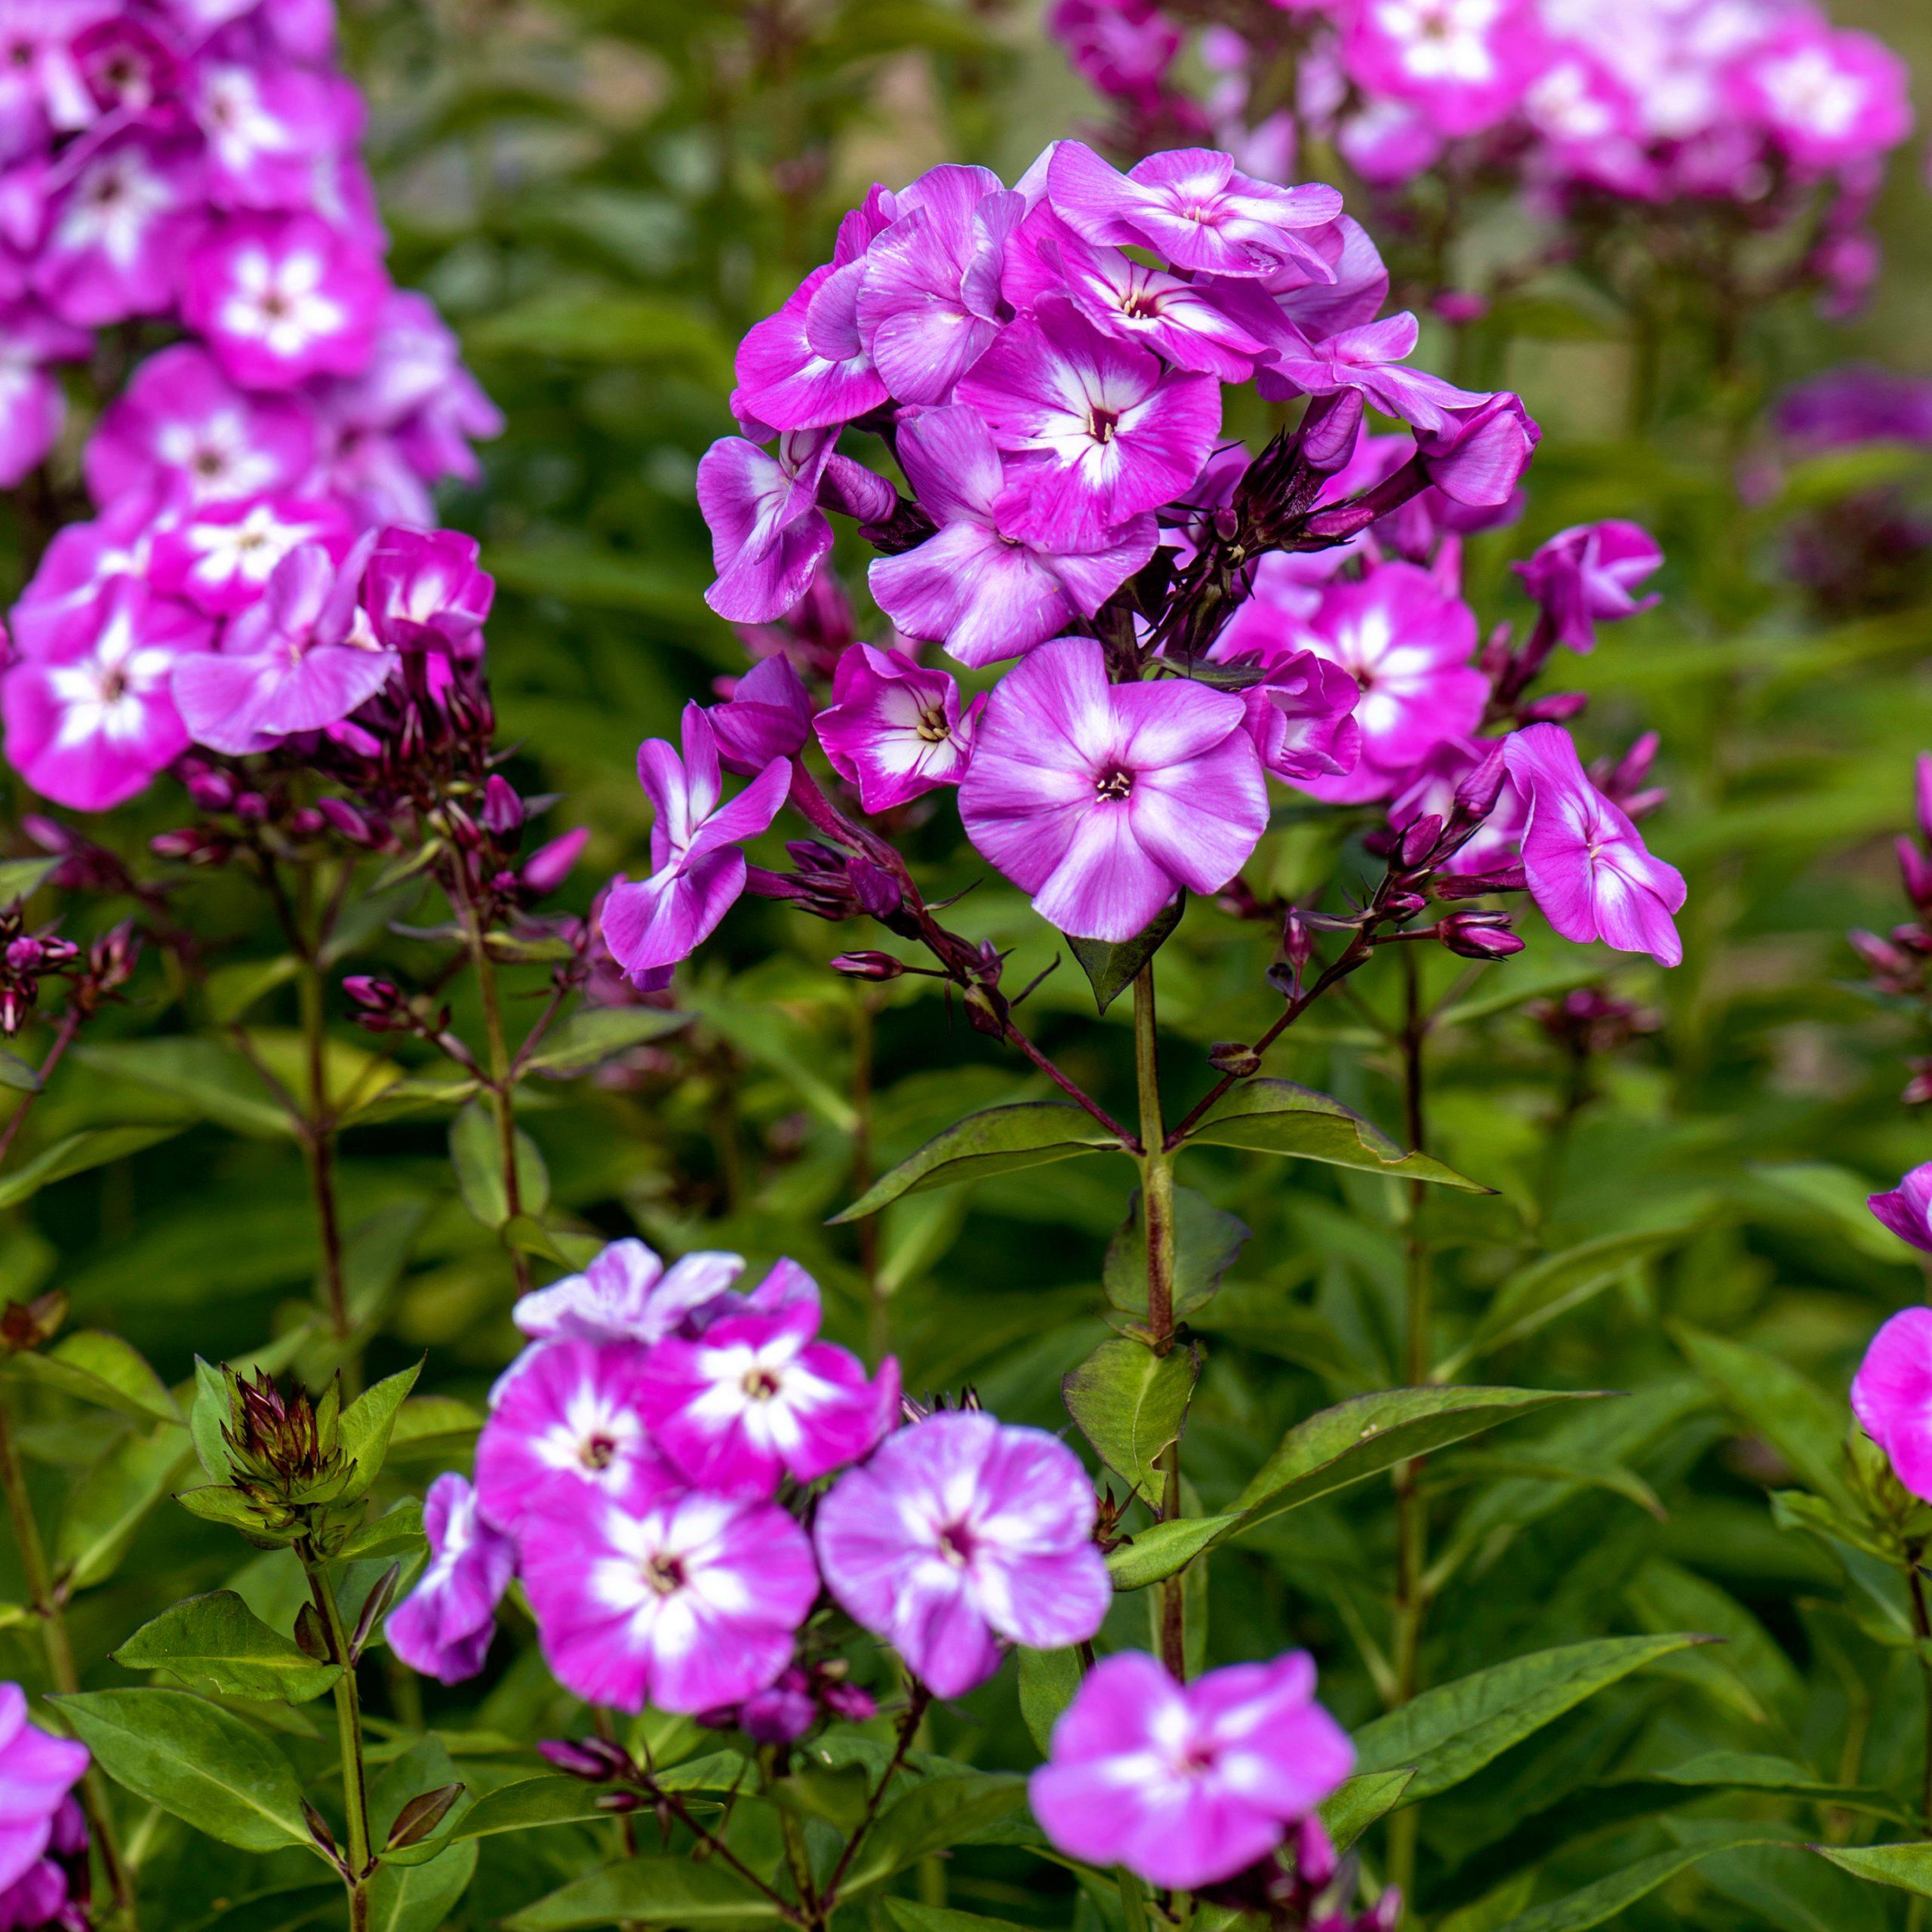 Beautiful pink, summer flowers of Phlox Paniculata 'Laura'